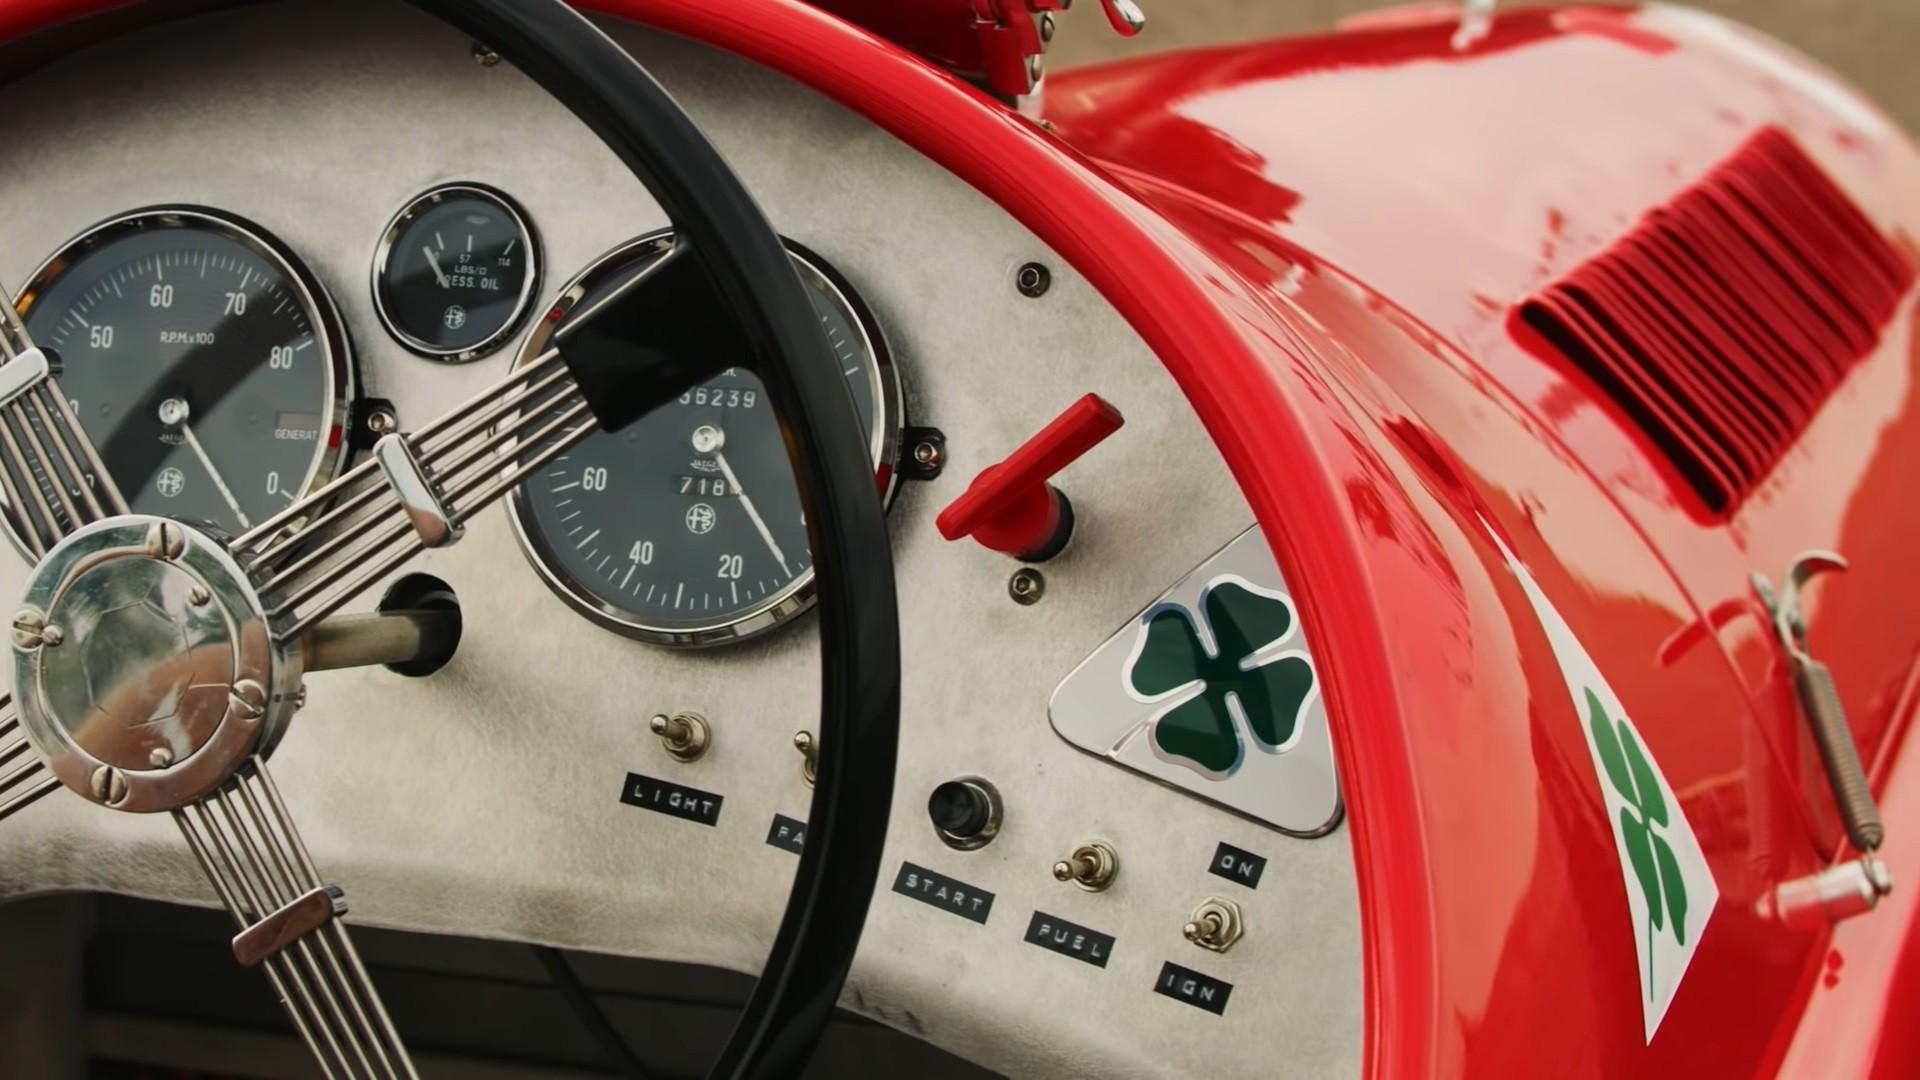 Alfa Romeo 158 Alfetta Kit Car Costs $10k Excluding Donor Mazda MX-5 Miata  - autoevolution